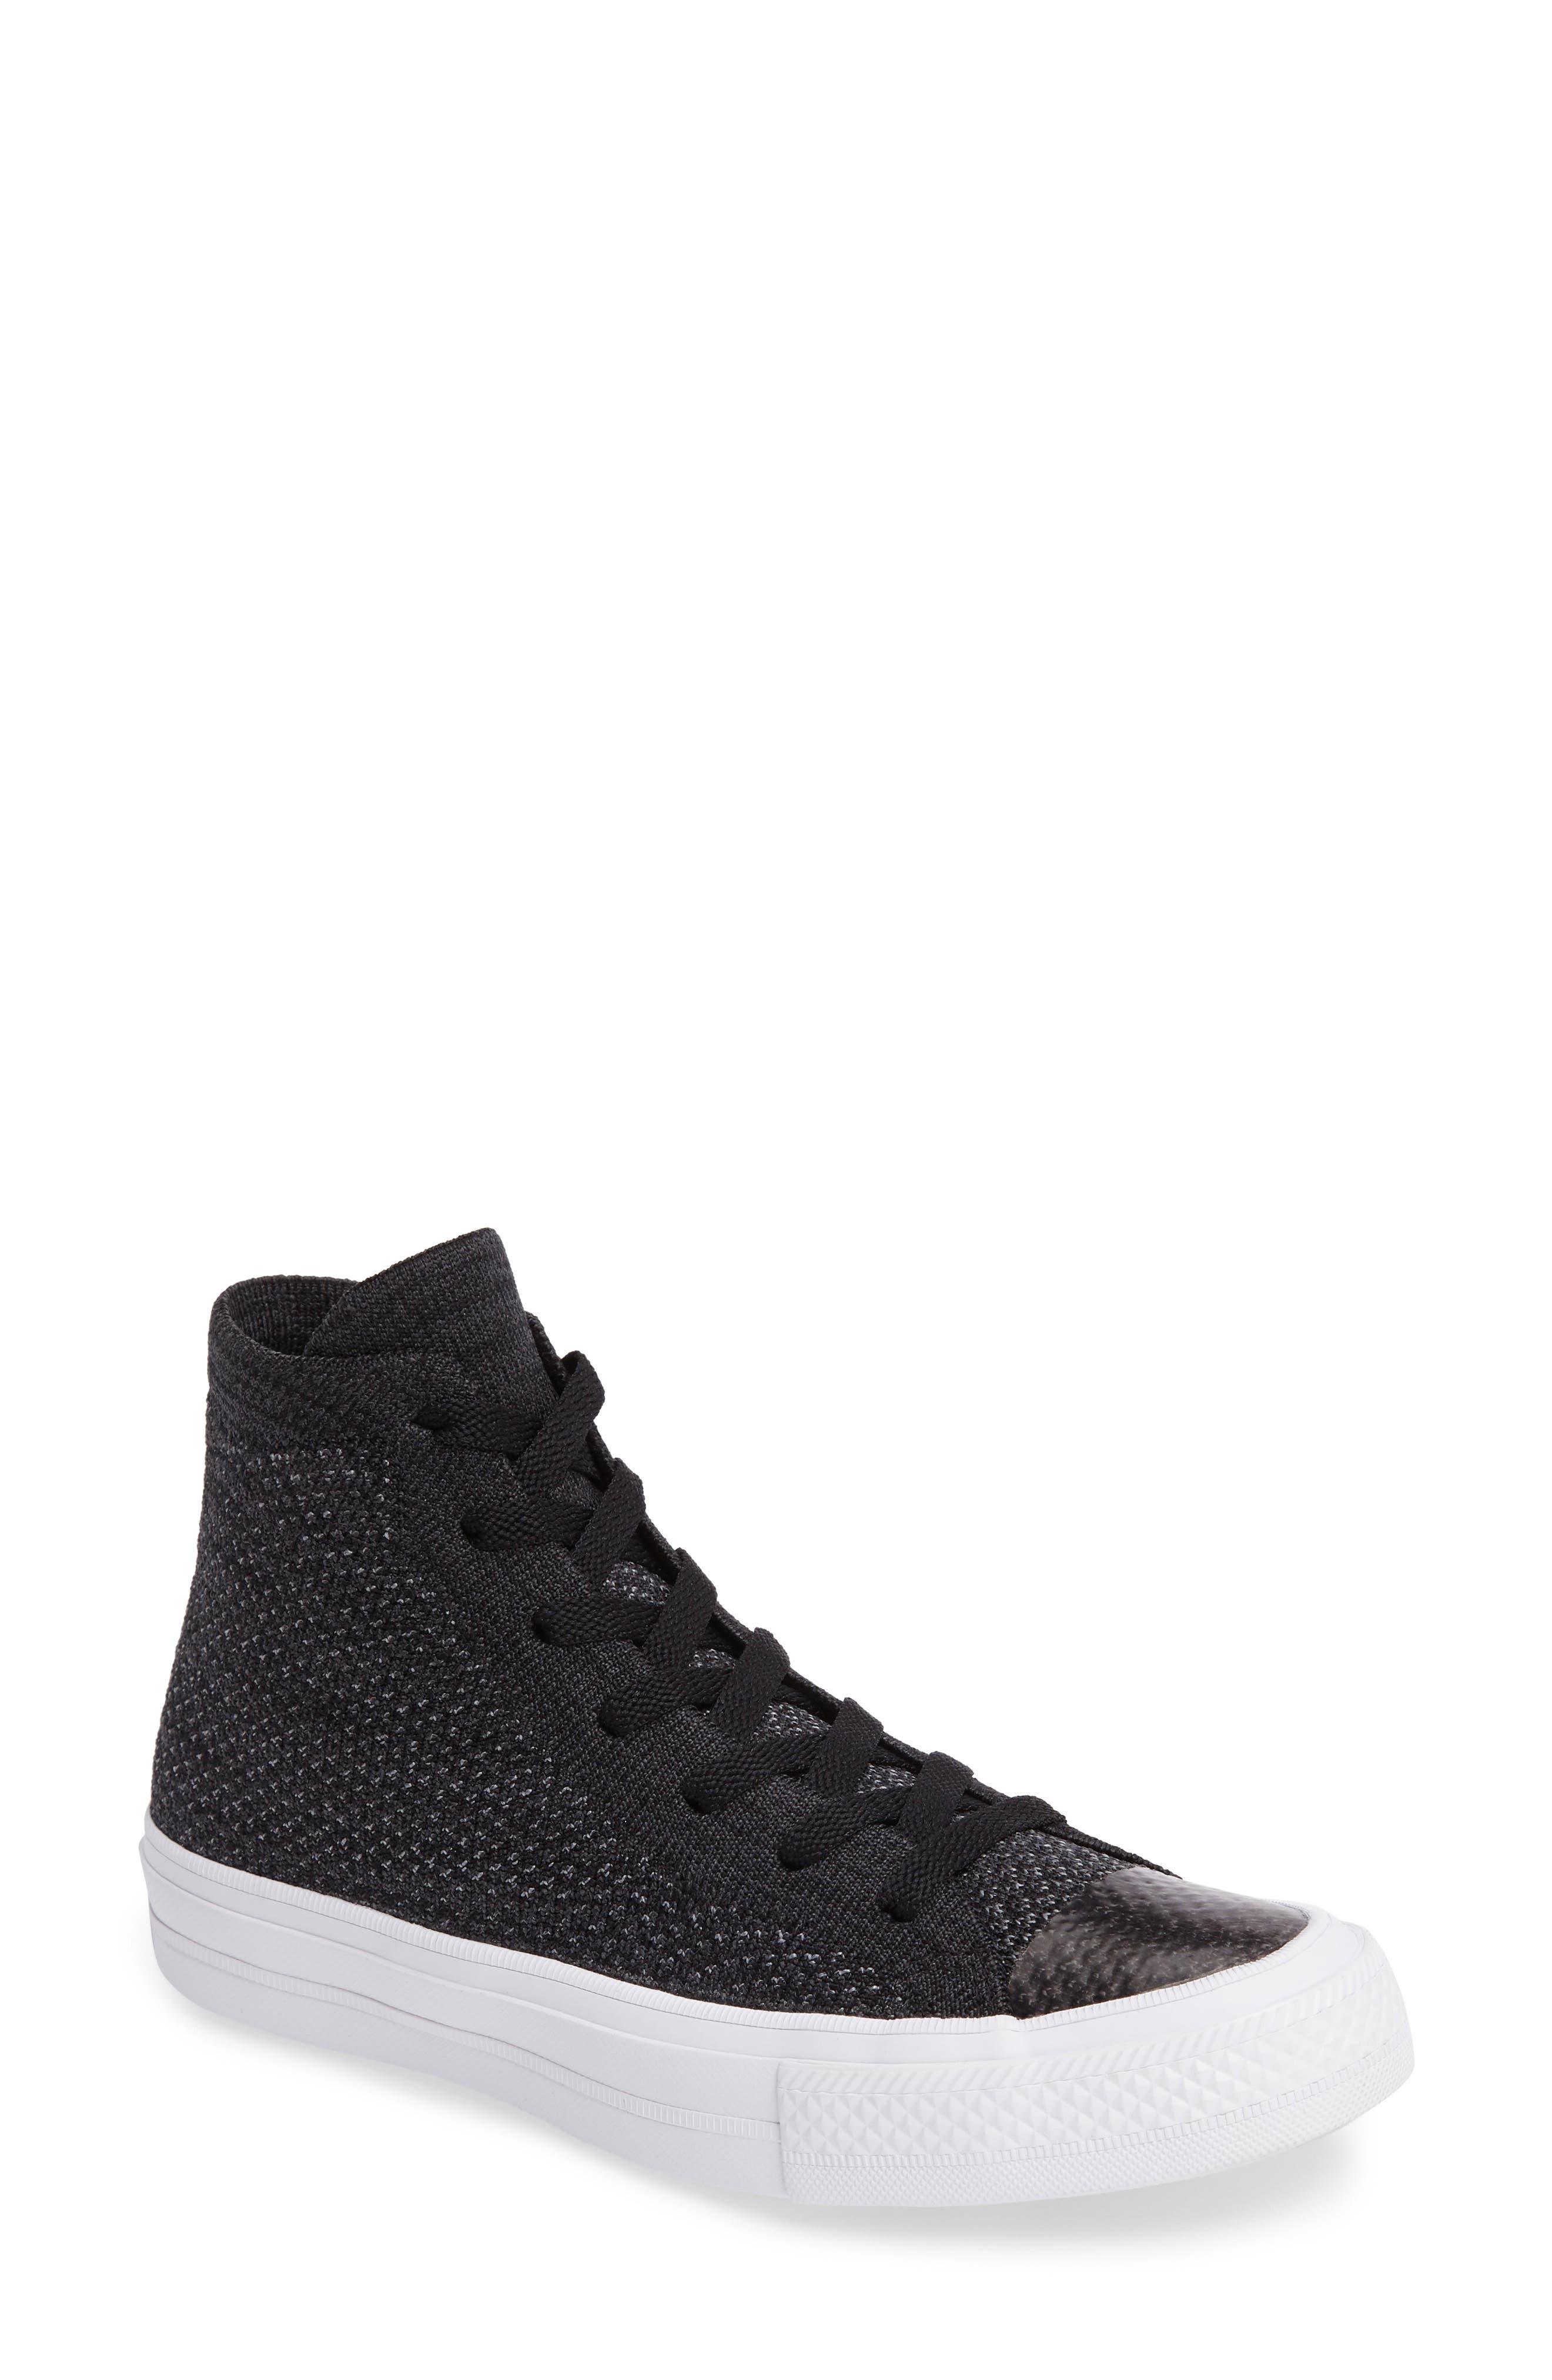 Converse Chuck Taylor® All Star® Fly Knit High Top Sneaker (Women)